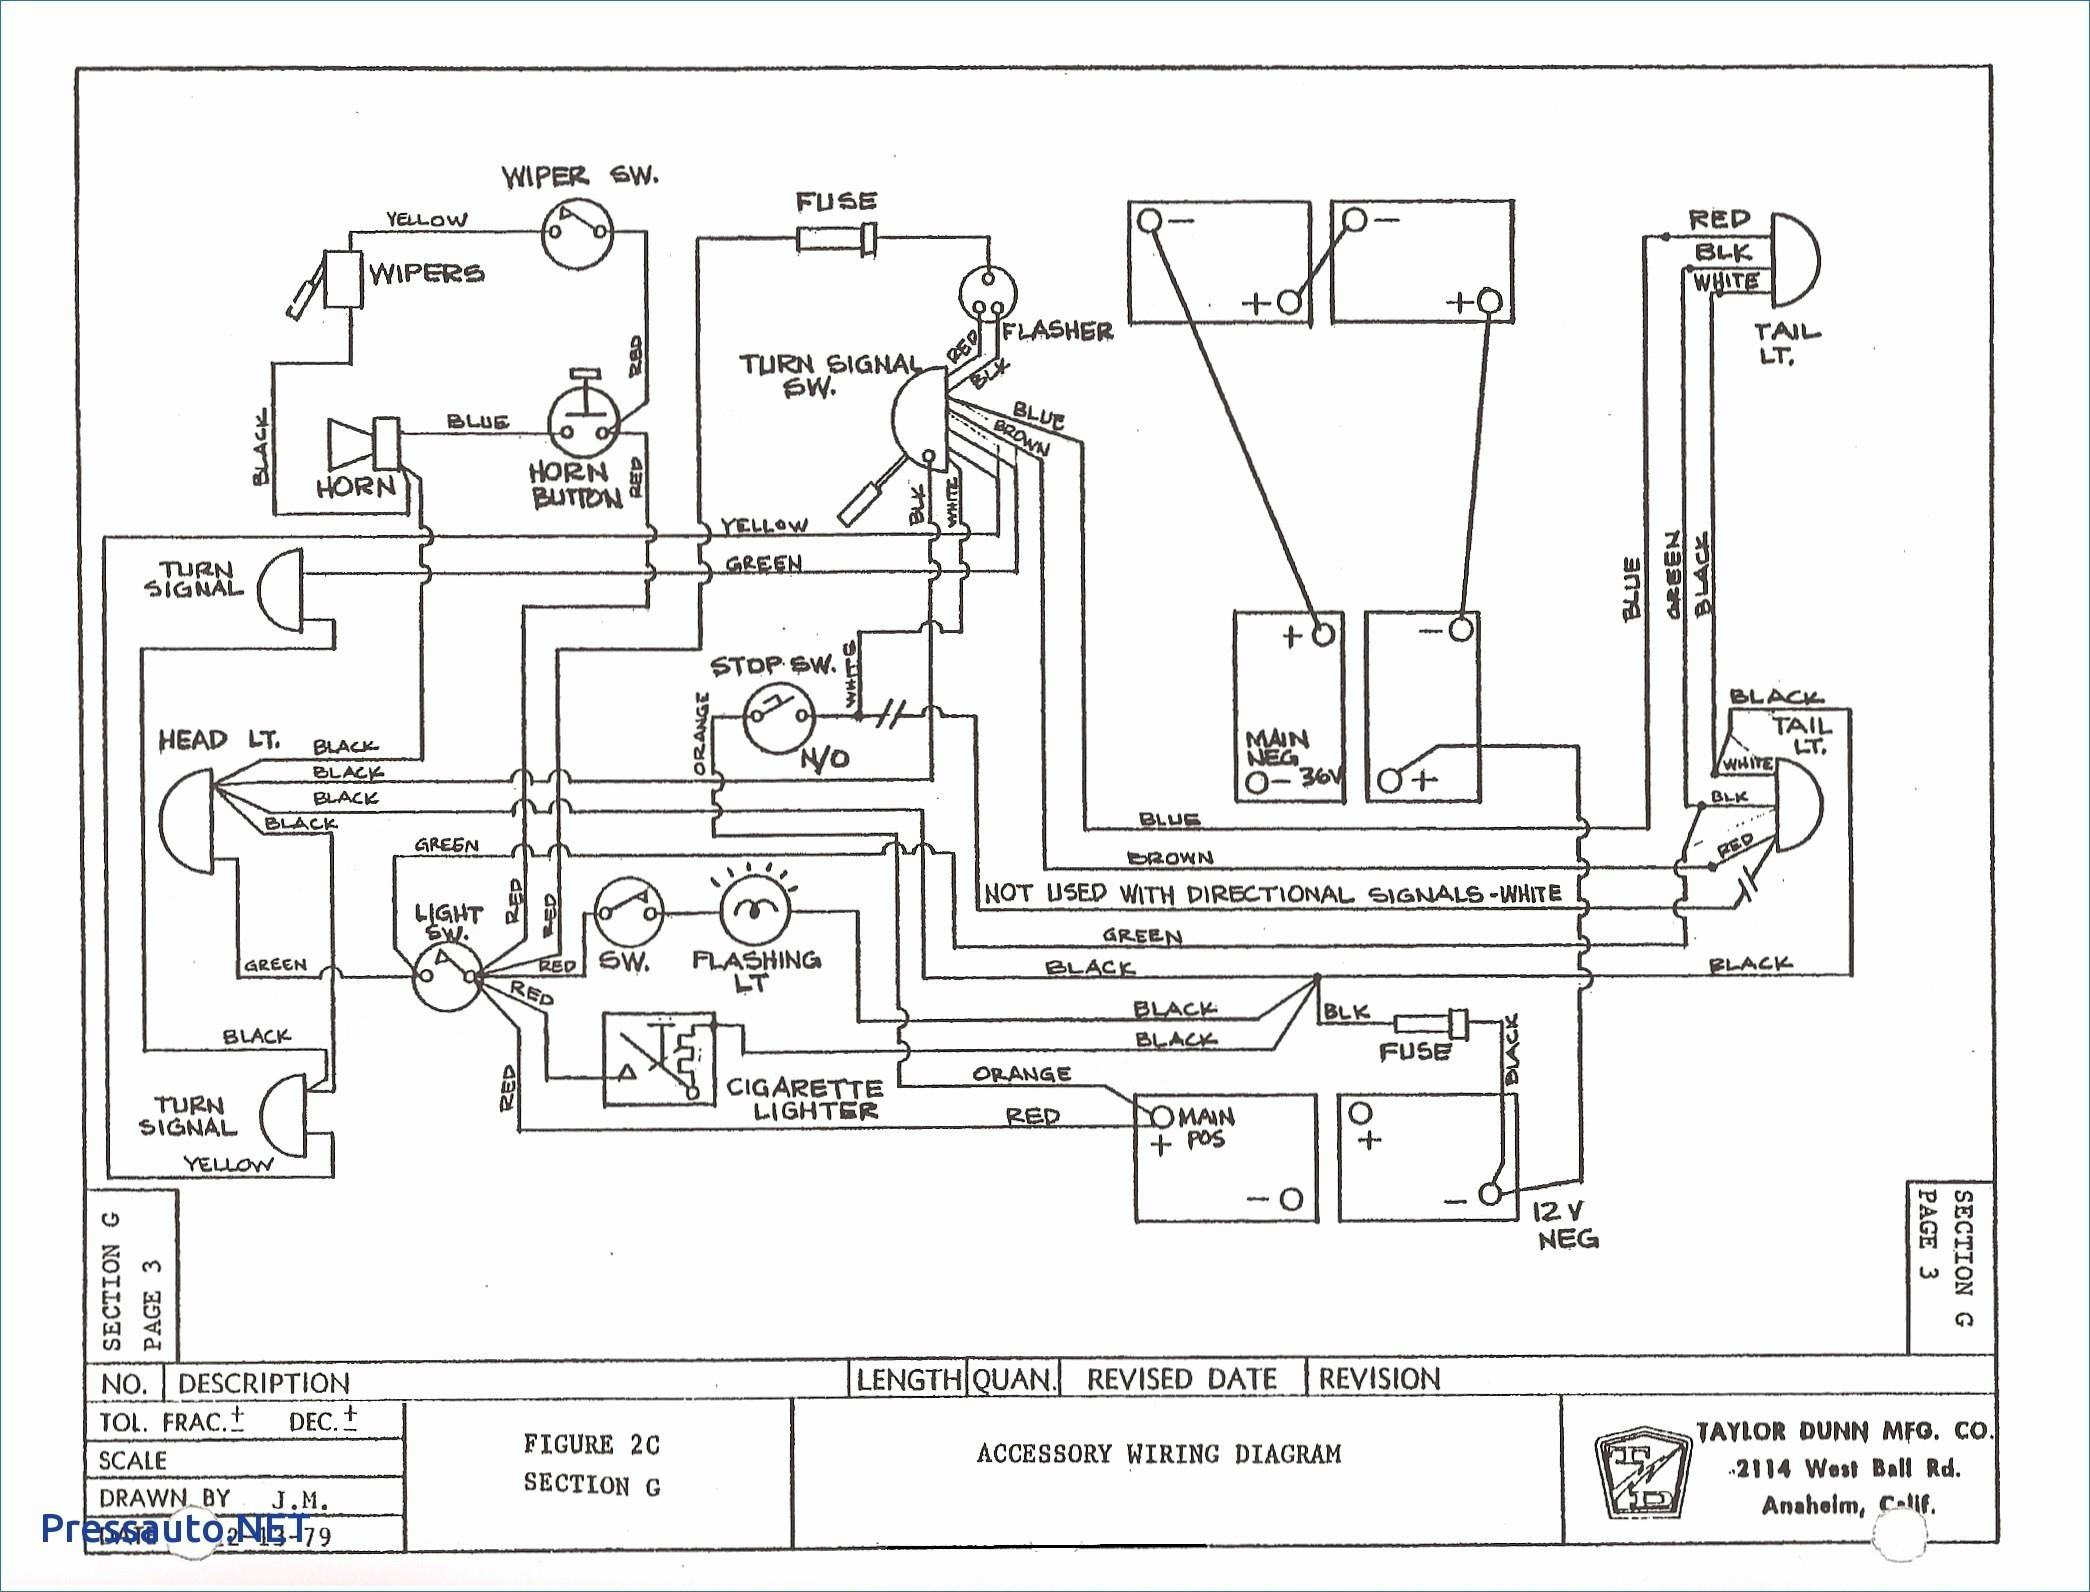 club car wiring diagram 36 volt Collection-Ezgo Txt 36 Volt Wiring Diagram New Wiring Diagram for Club Car Electric Golf Cart New 1-p